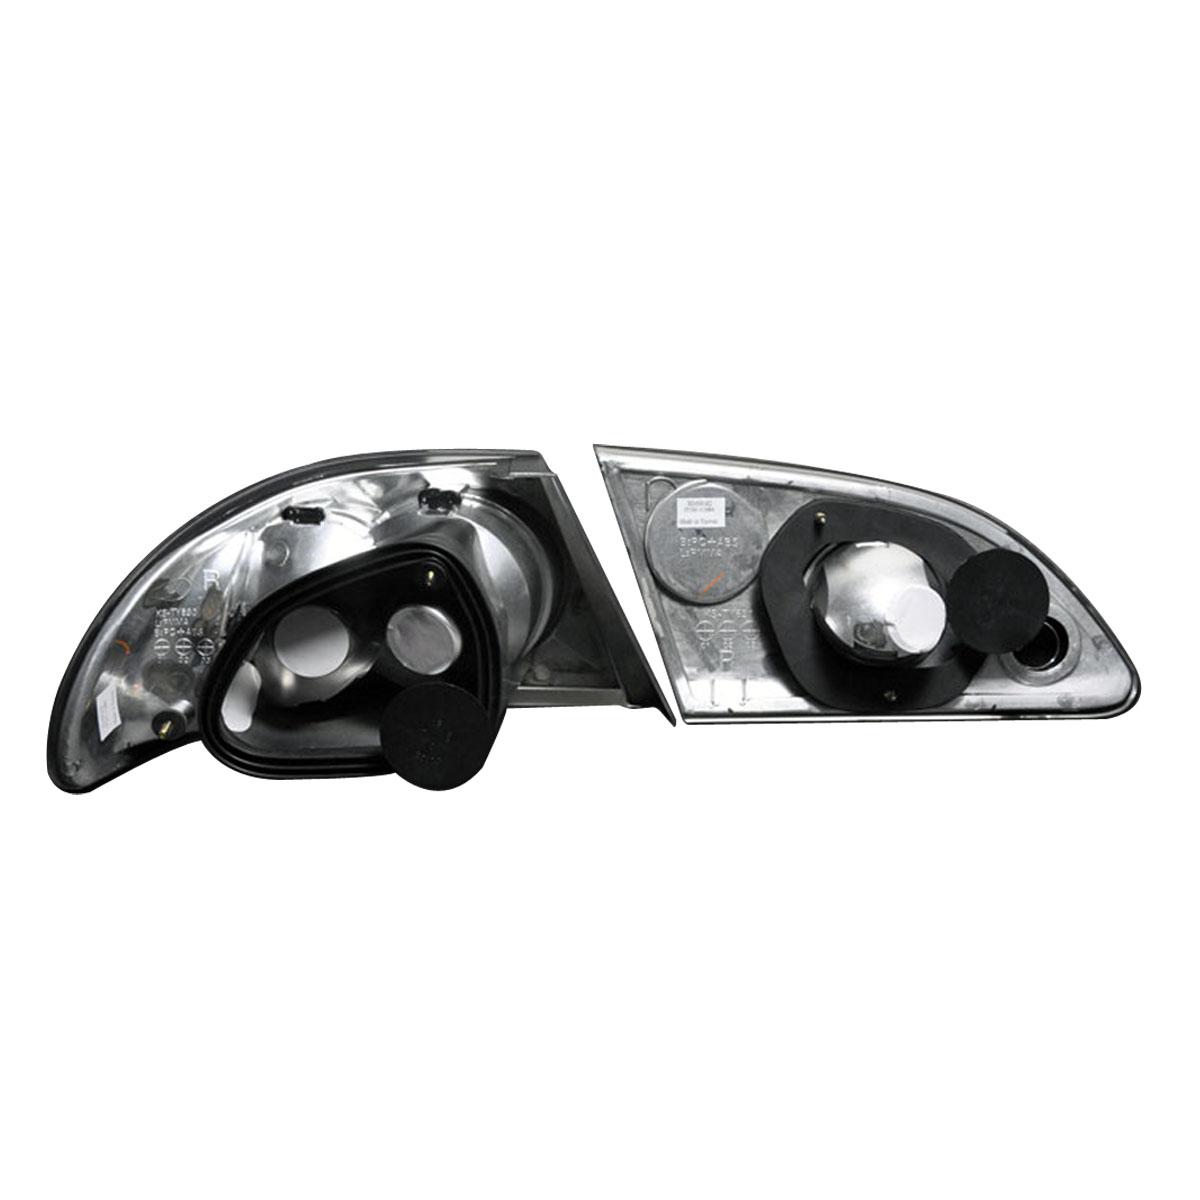 1998 1999 2000 2001 2002 toyota corolla black tail lights set. Black Bedroom Furniture Sets. Home Design Ideas